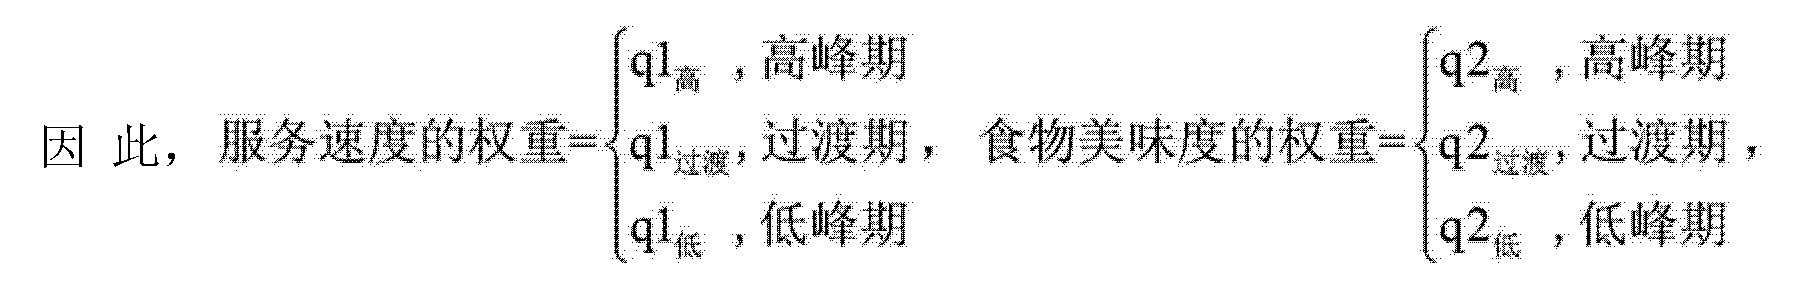 Figure CN104091295AD00082